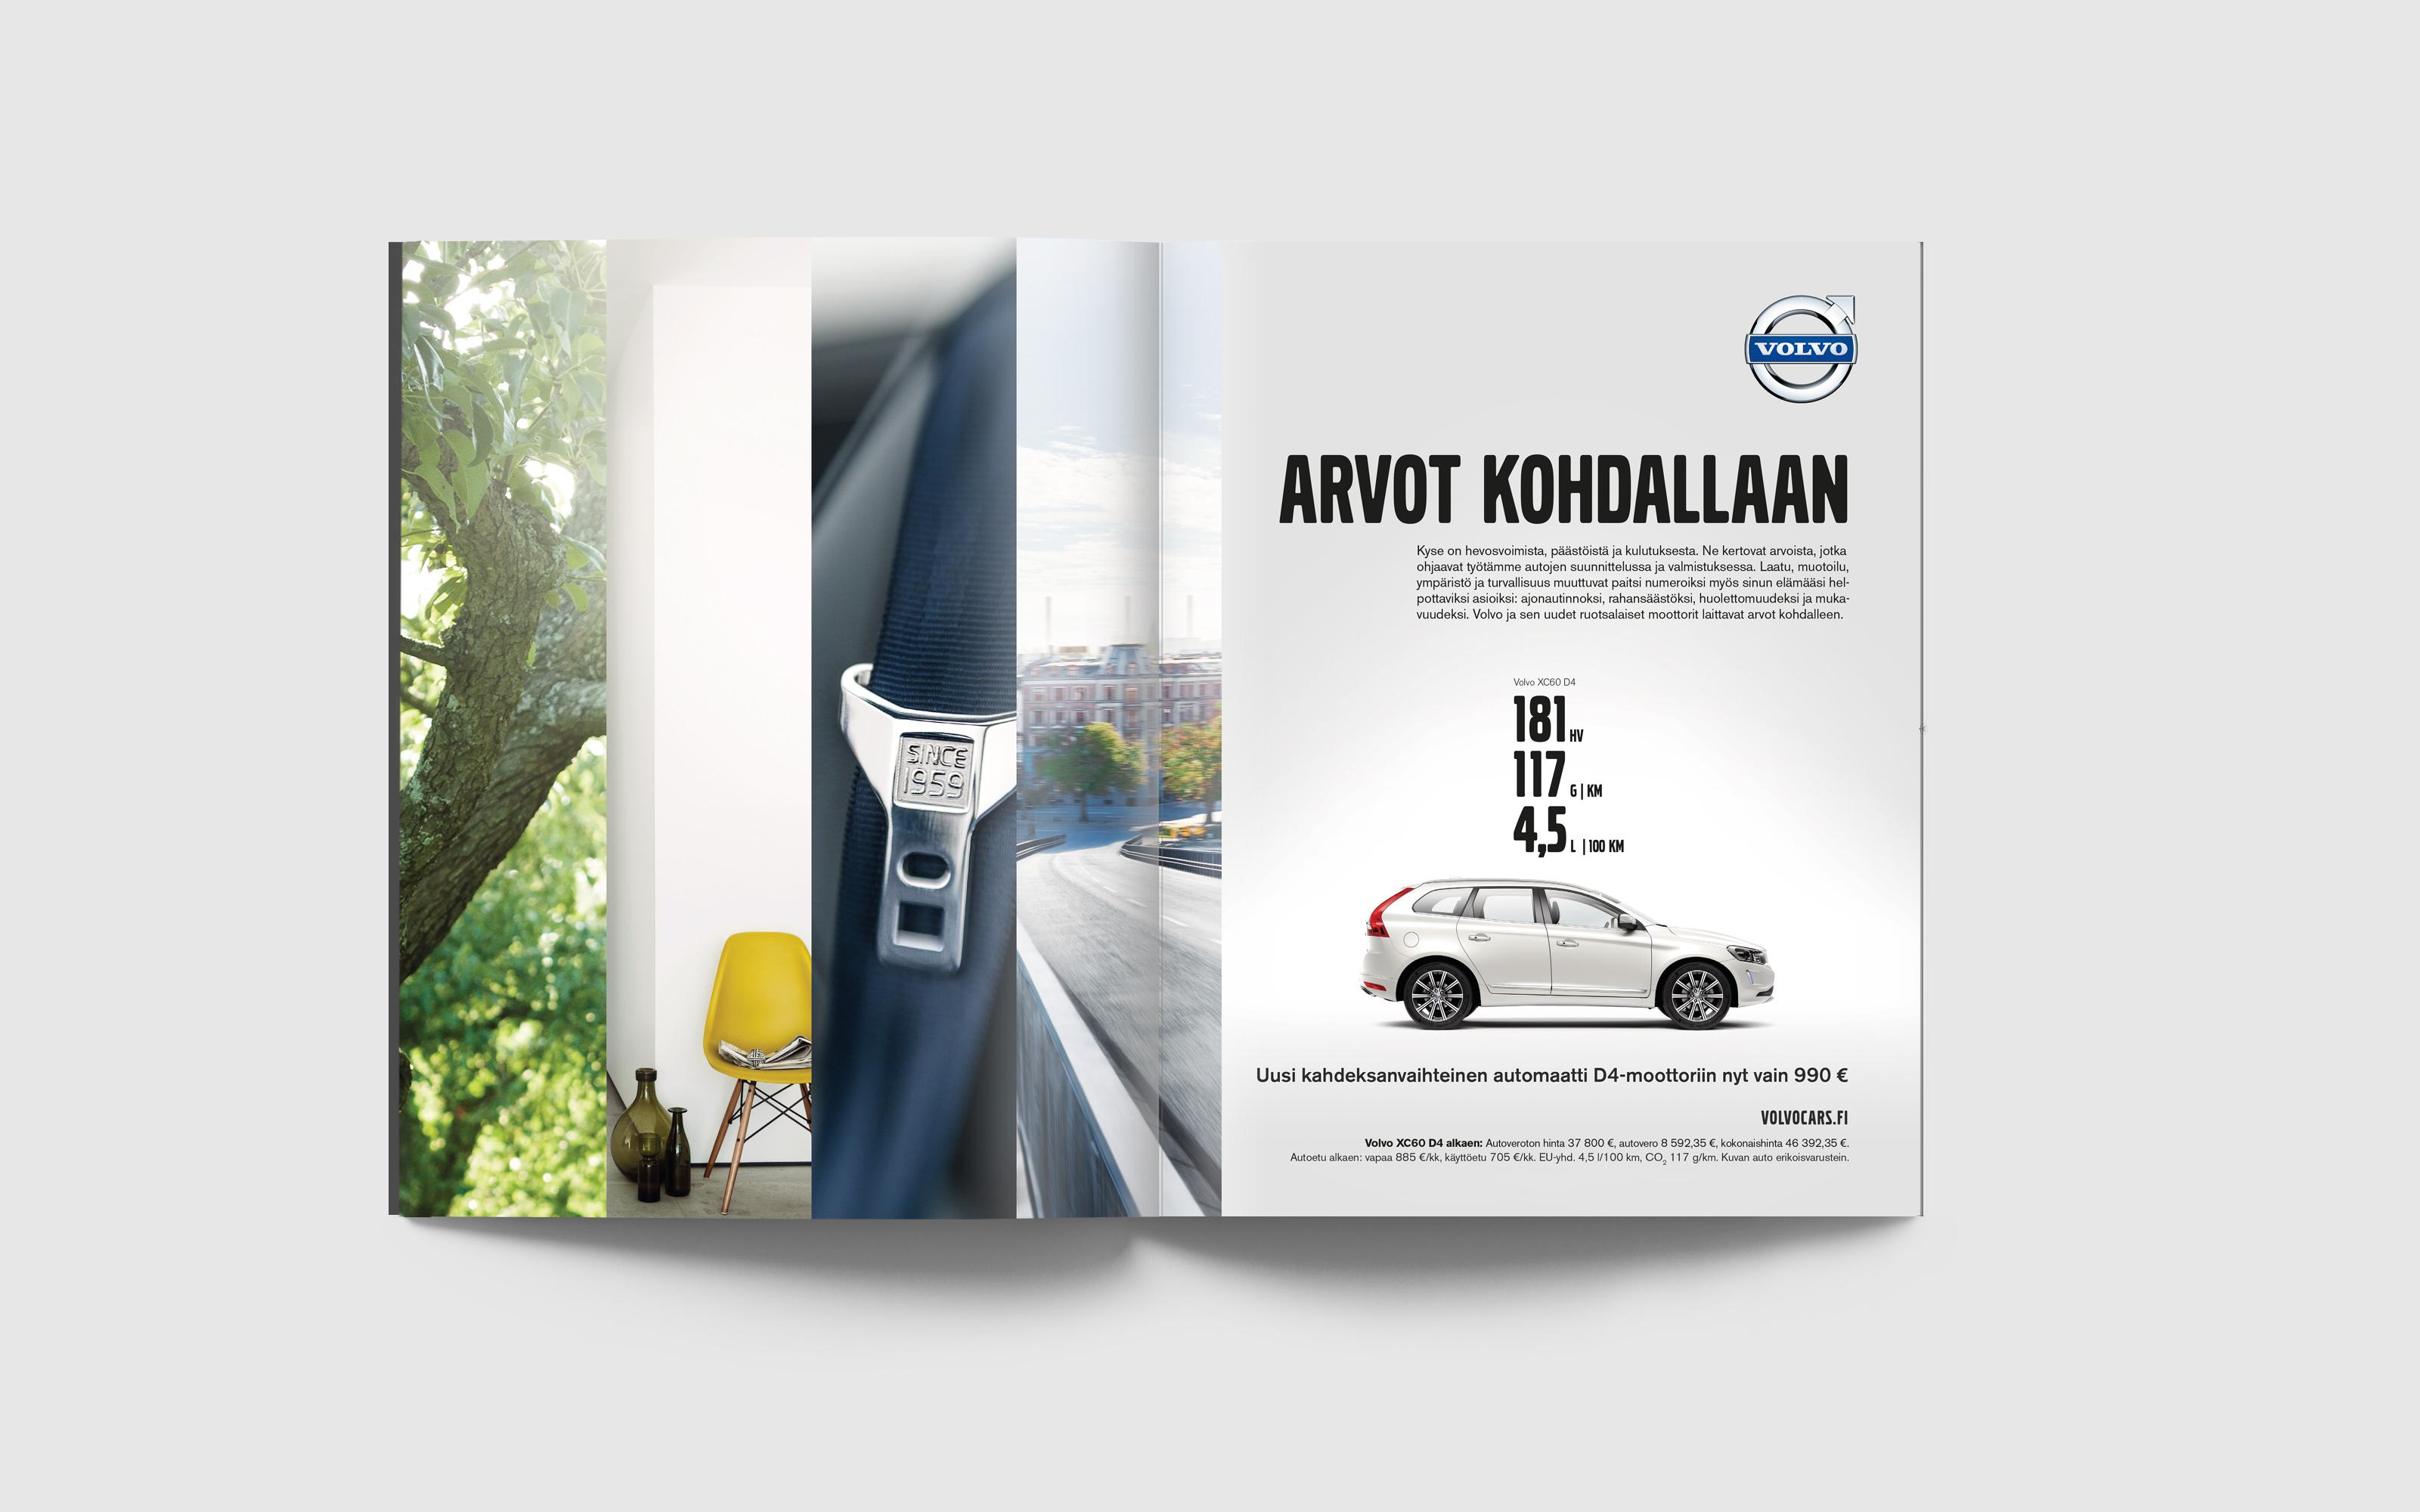 Volvo arvot spread